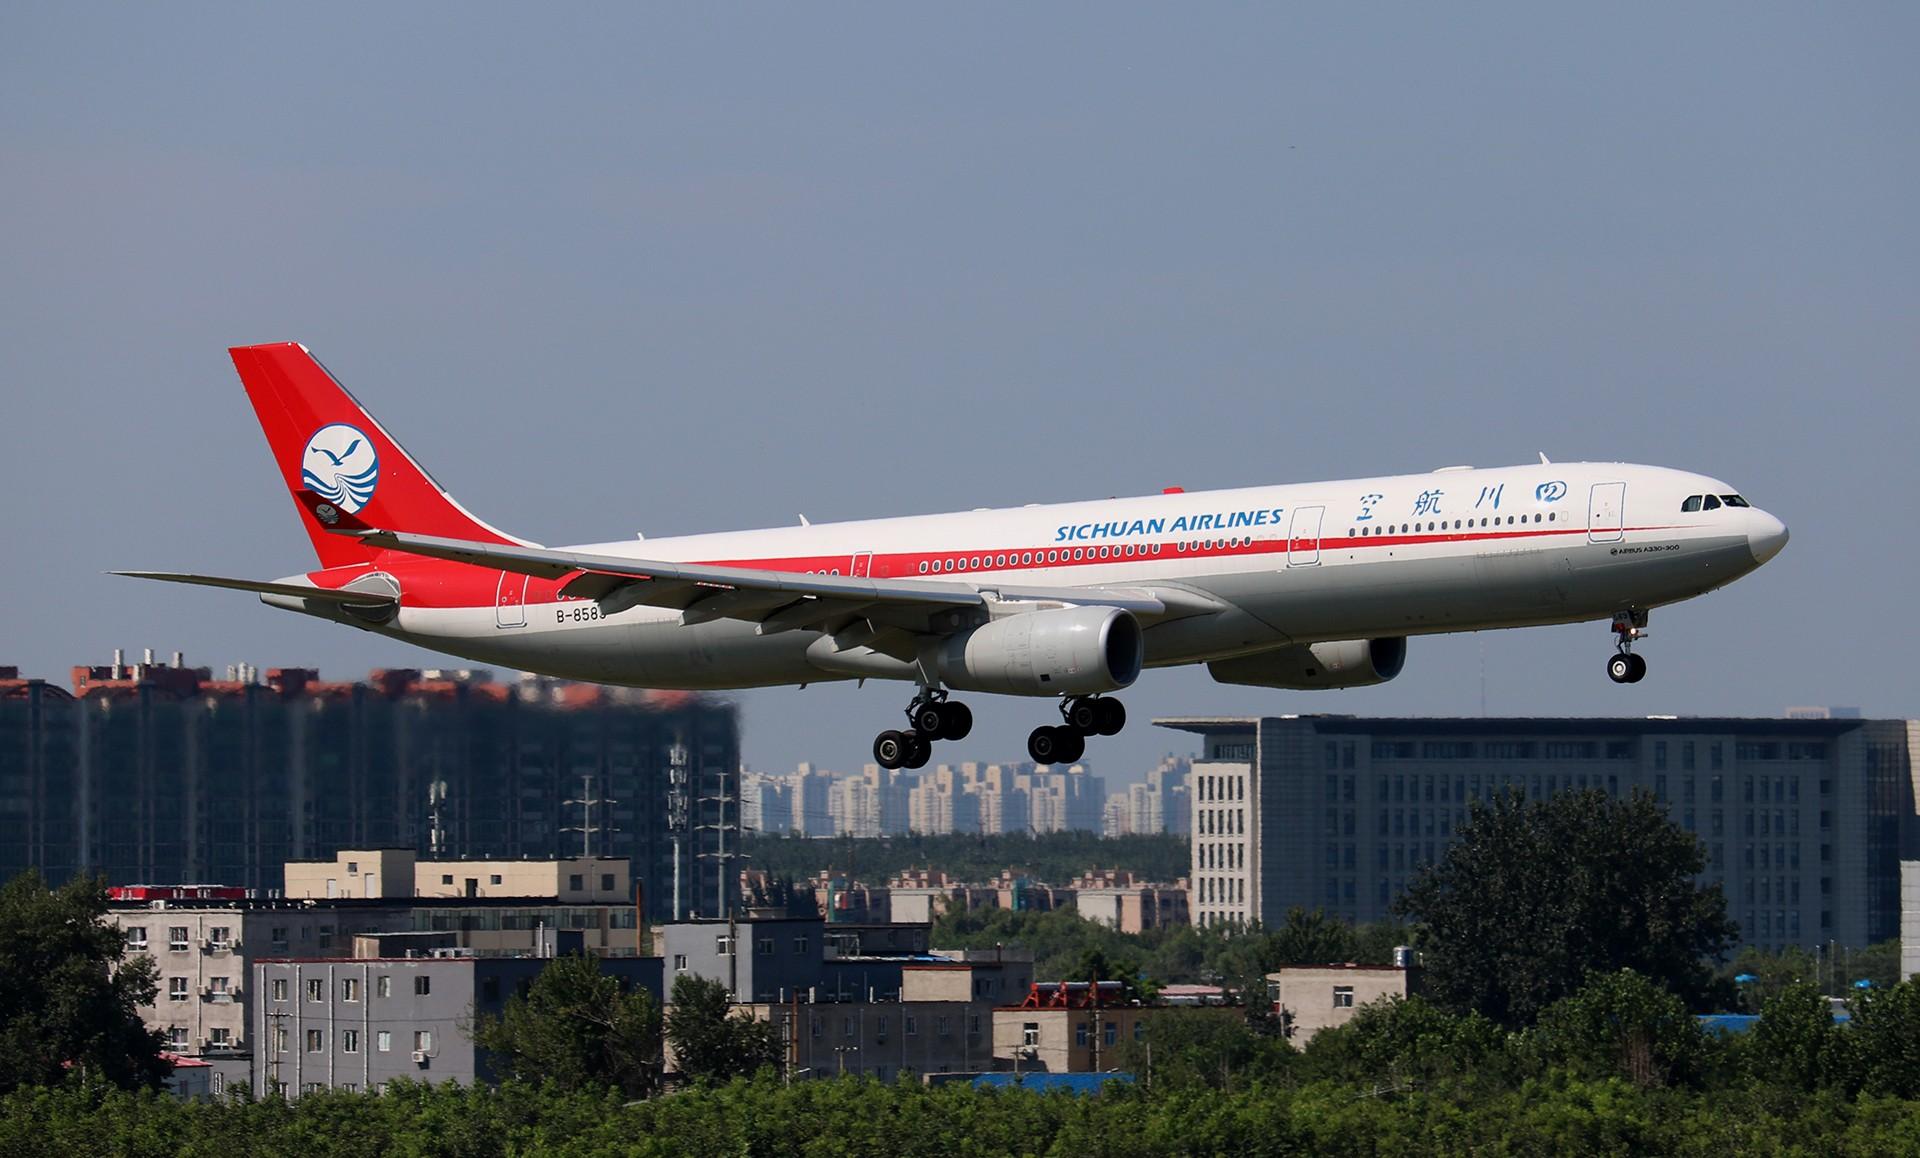 Re:[原创]LIULIU|【PEK】36L降落一组Ⅴ|城市背景下的进近 AIRBUS A330-300 B-8589 中国北京首都国际机场